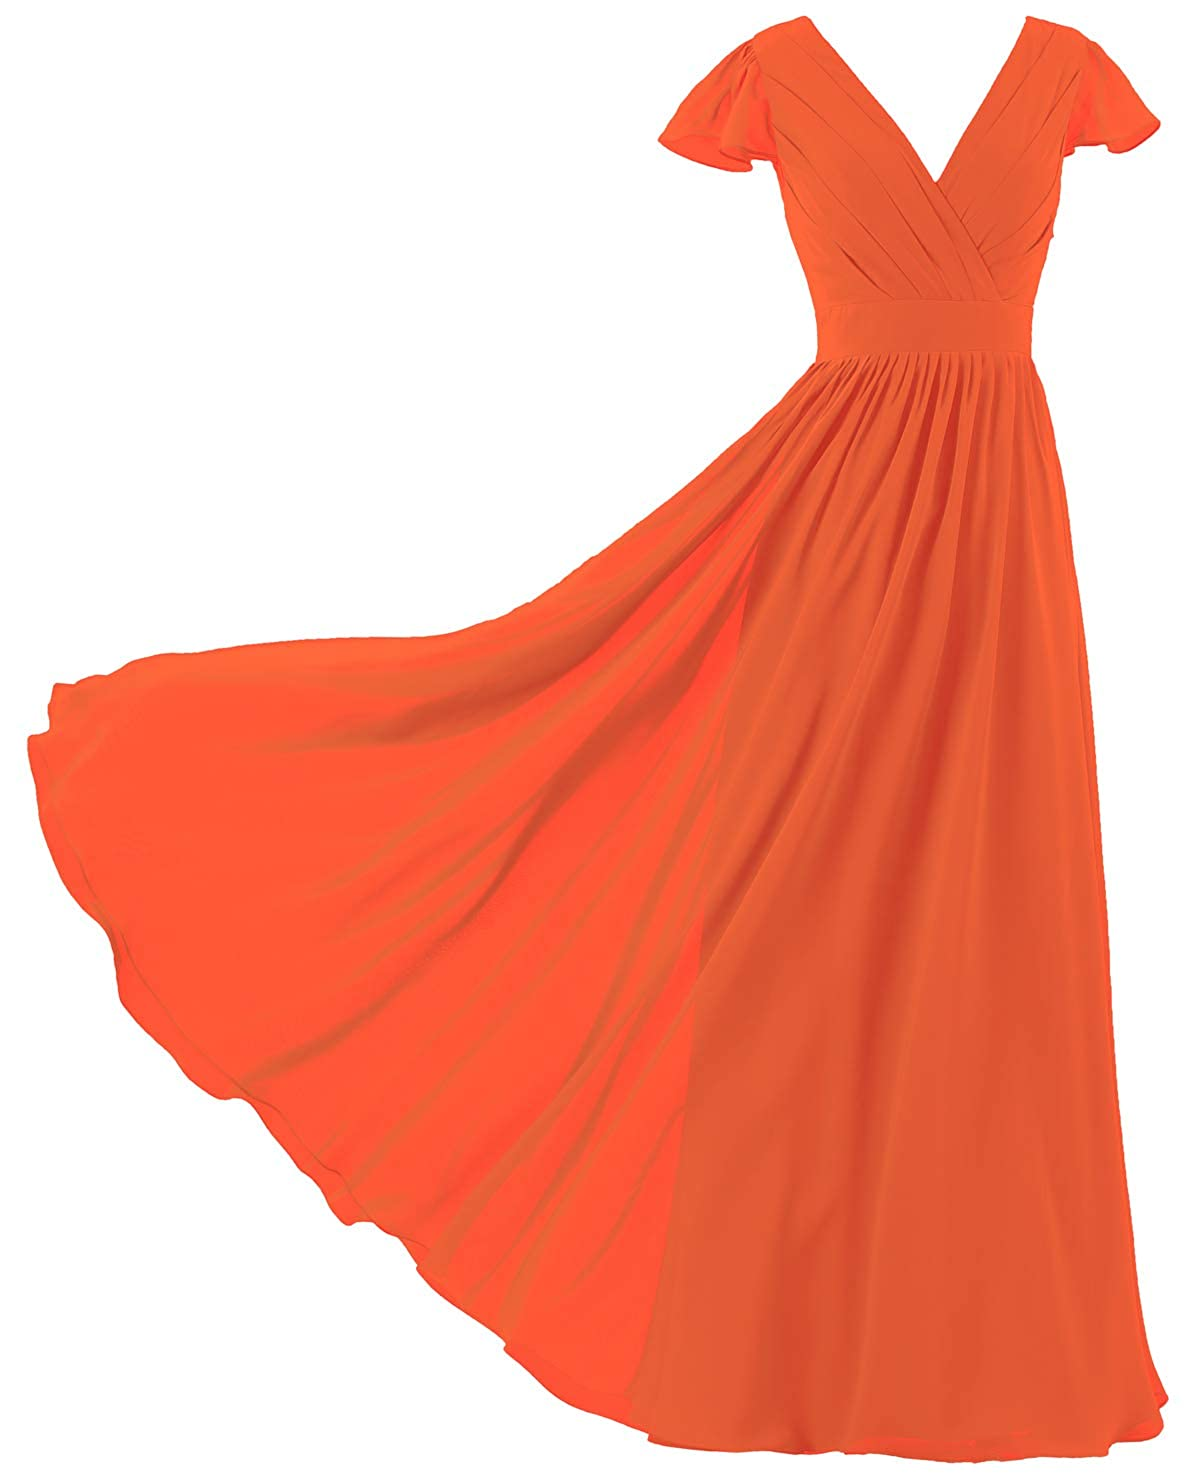 ZAXANTS Womens V Neck Cap Sleeve Bridesmaid Dresses Long Evening Gown